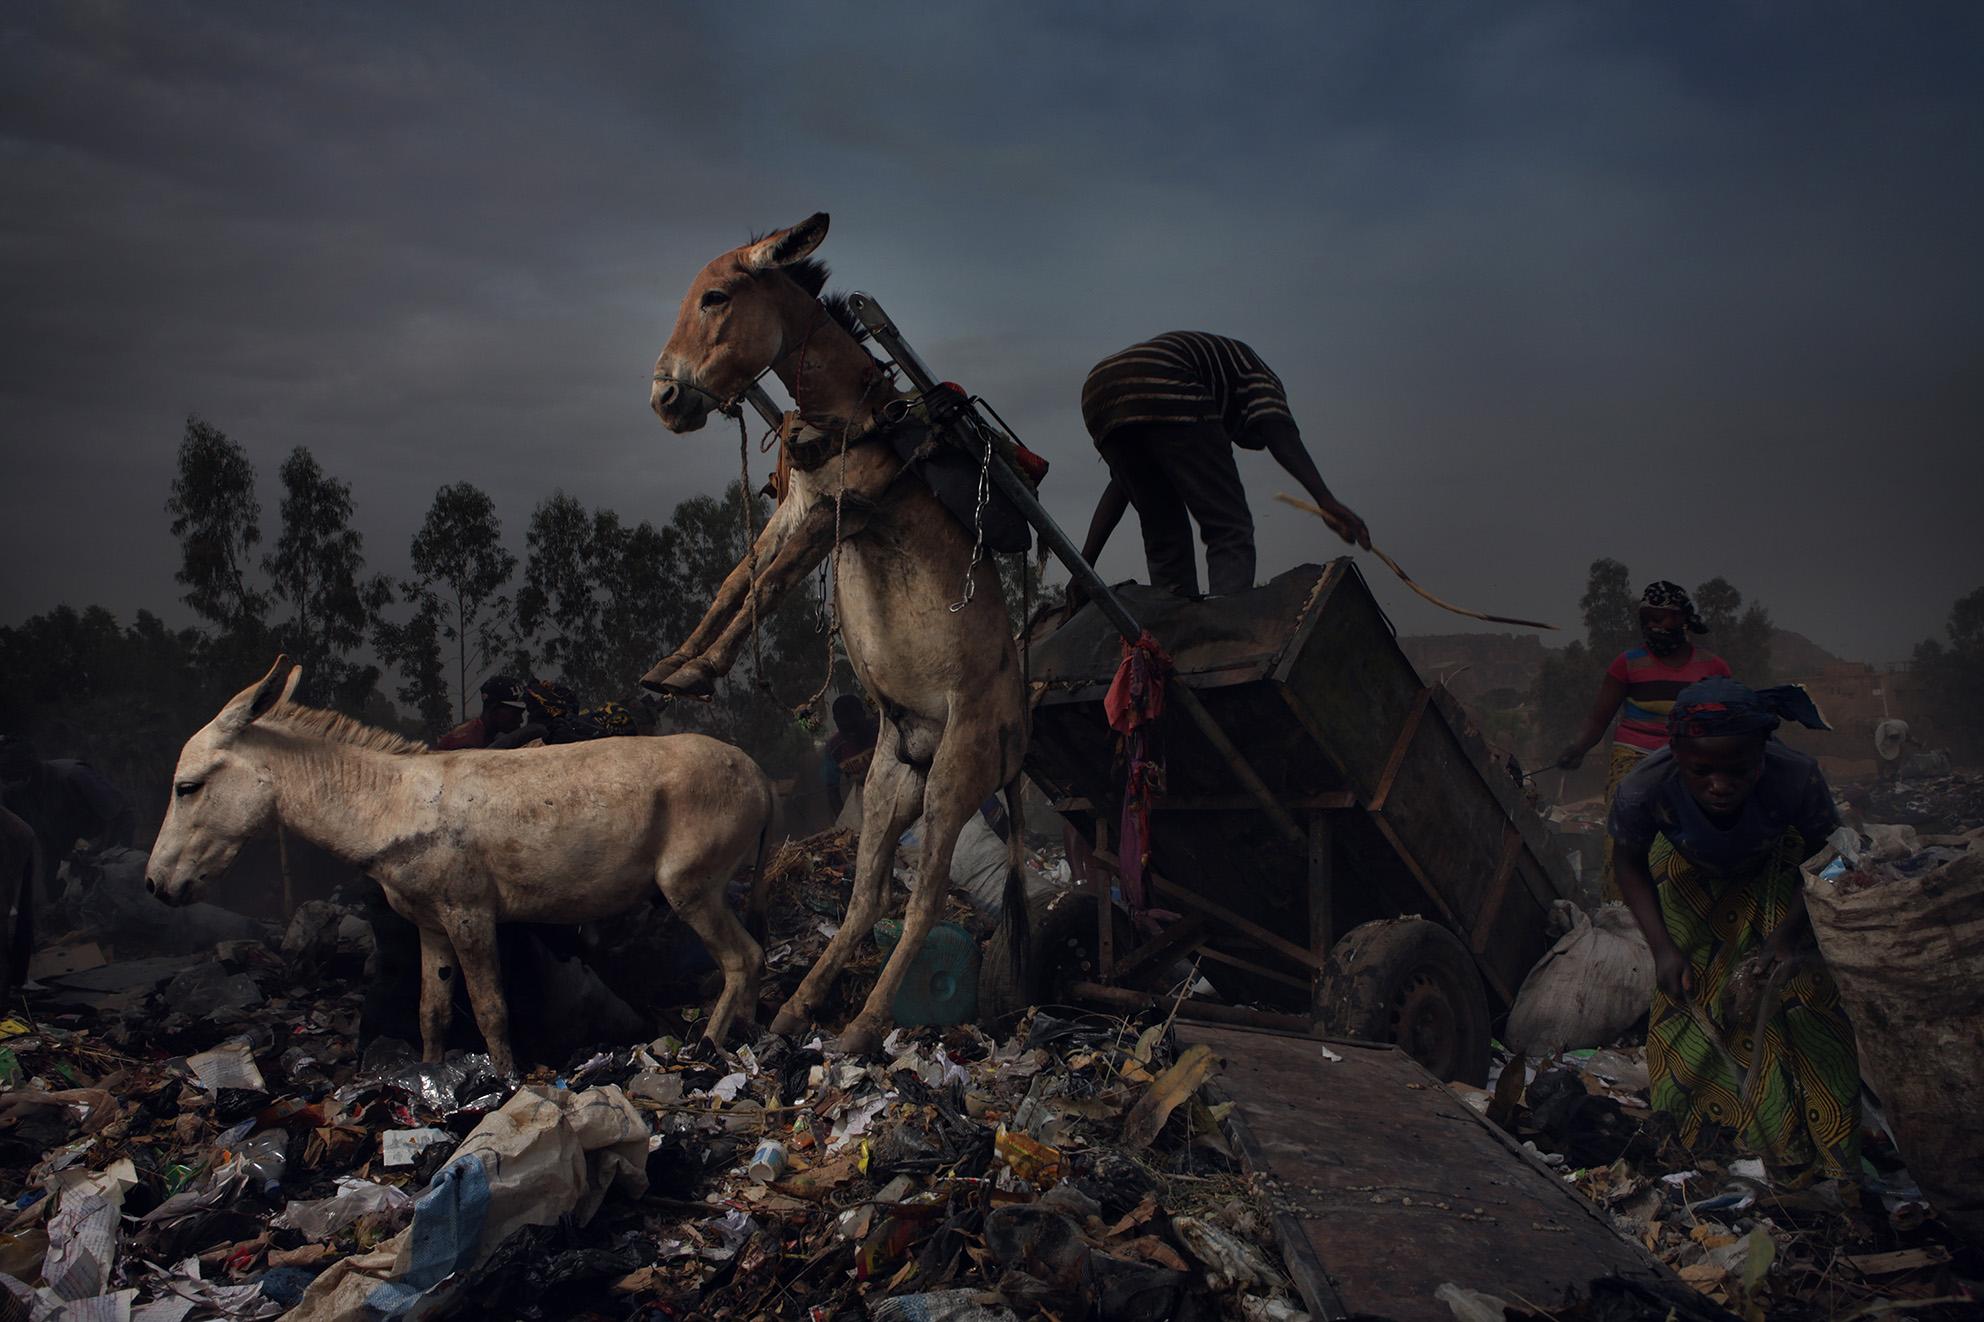 Wahib Chehata,  Les ânes , 2019, 160 x 240 cm, tirage sur papier Baryté  © Wahib Chehata, Courtoisie A2Z Gallery